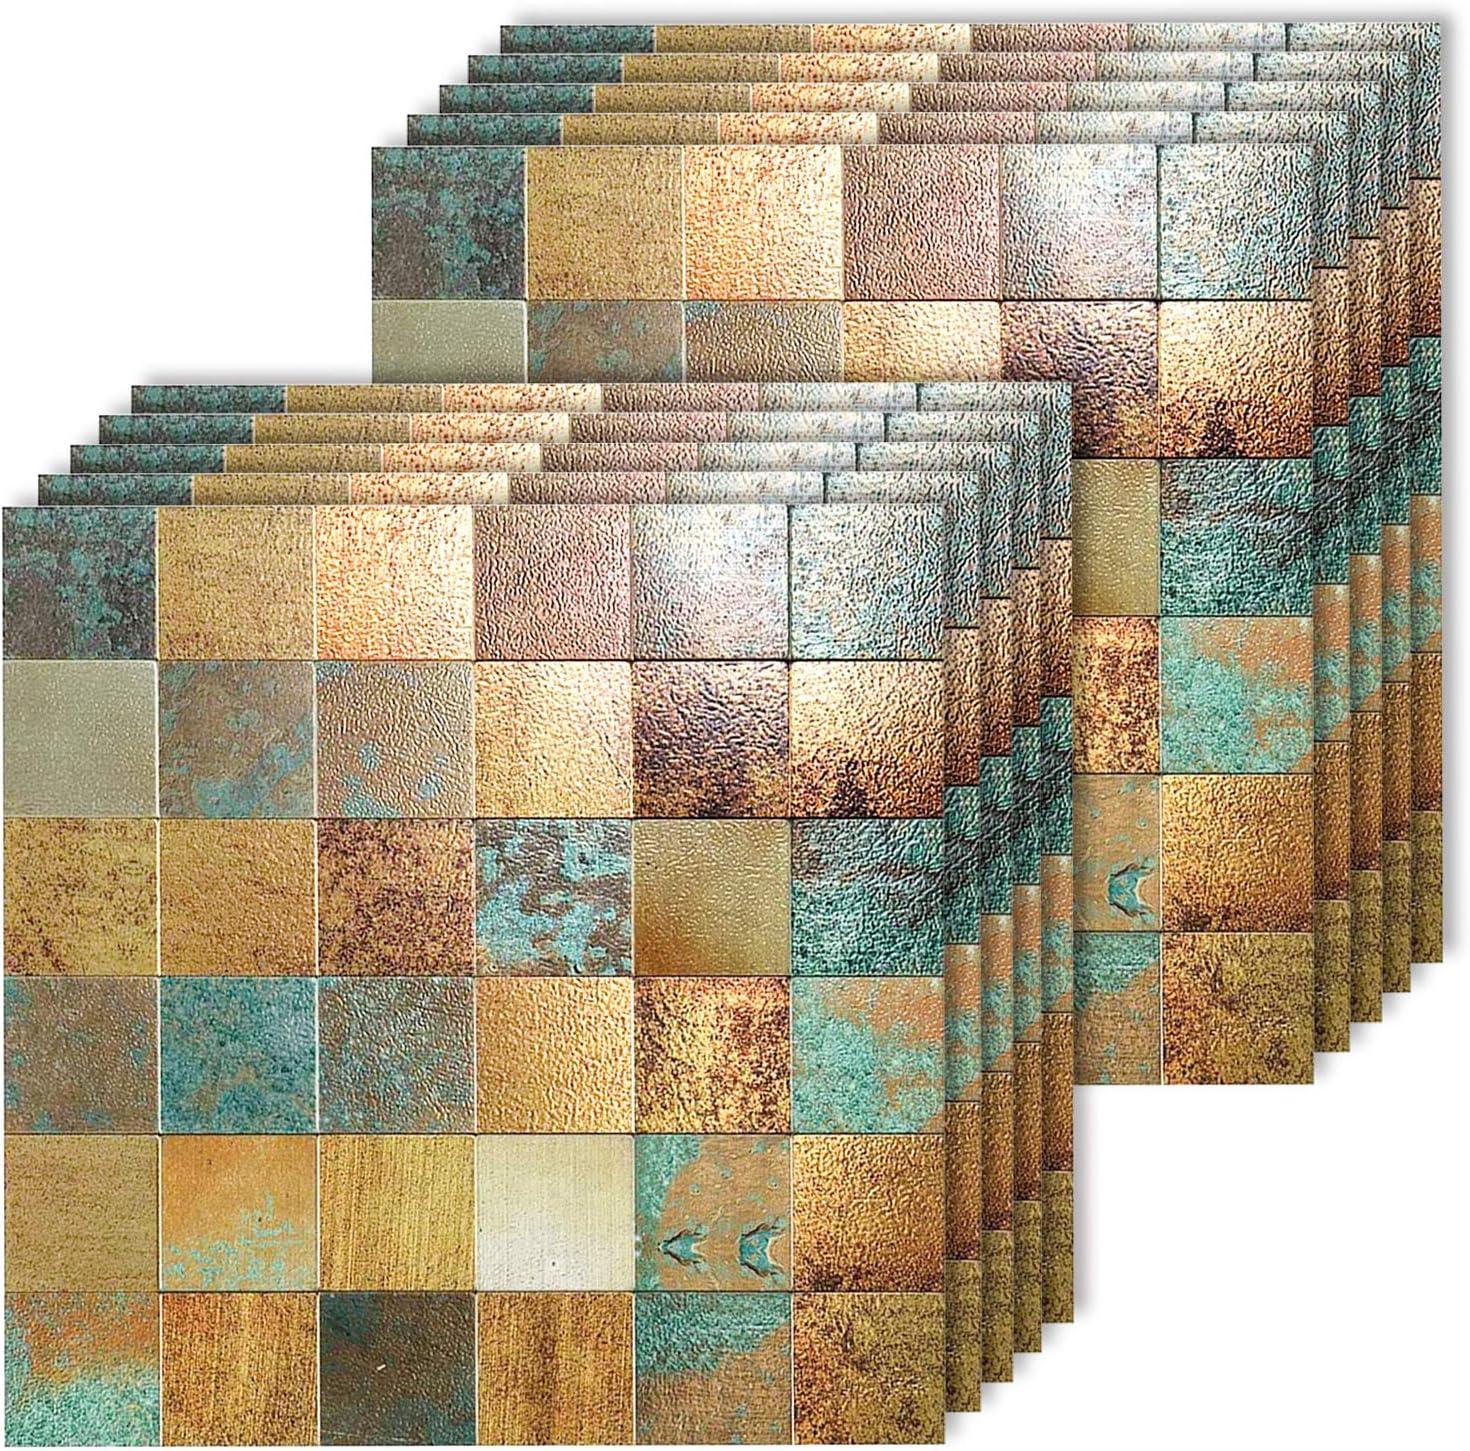 Max 67% favorite OFF HomeyMosaic 10-Sheet Peel and Stick for Kitchen Backsplash Tile